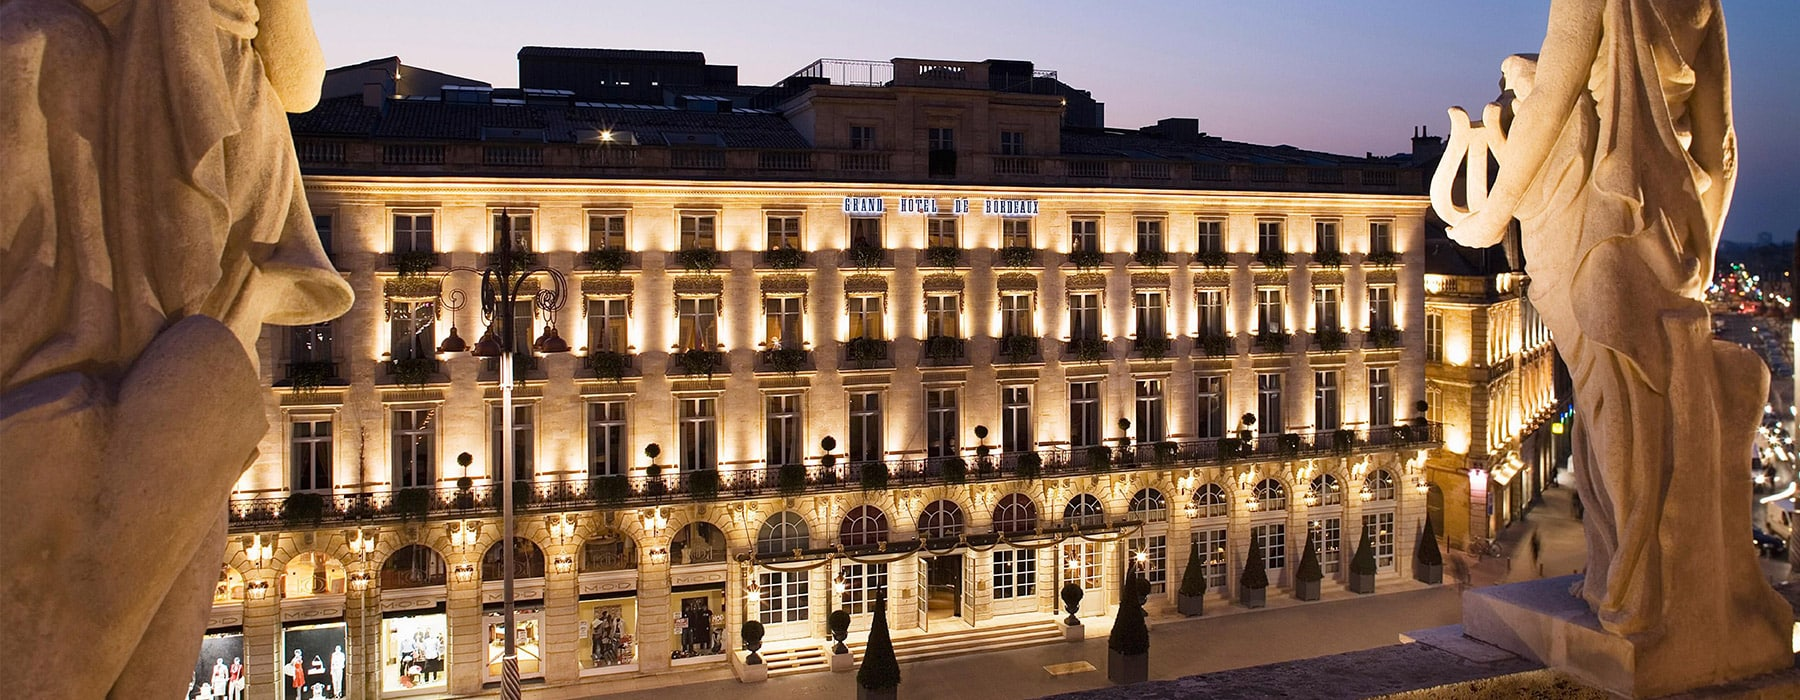 InterContinental Bordeaux – The Great Hôtel